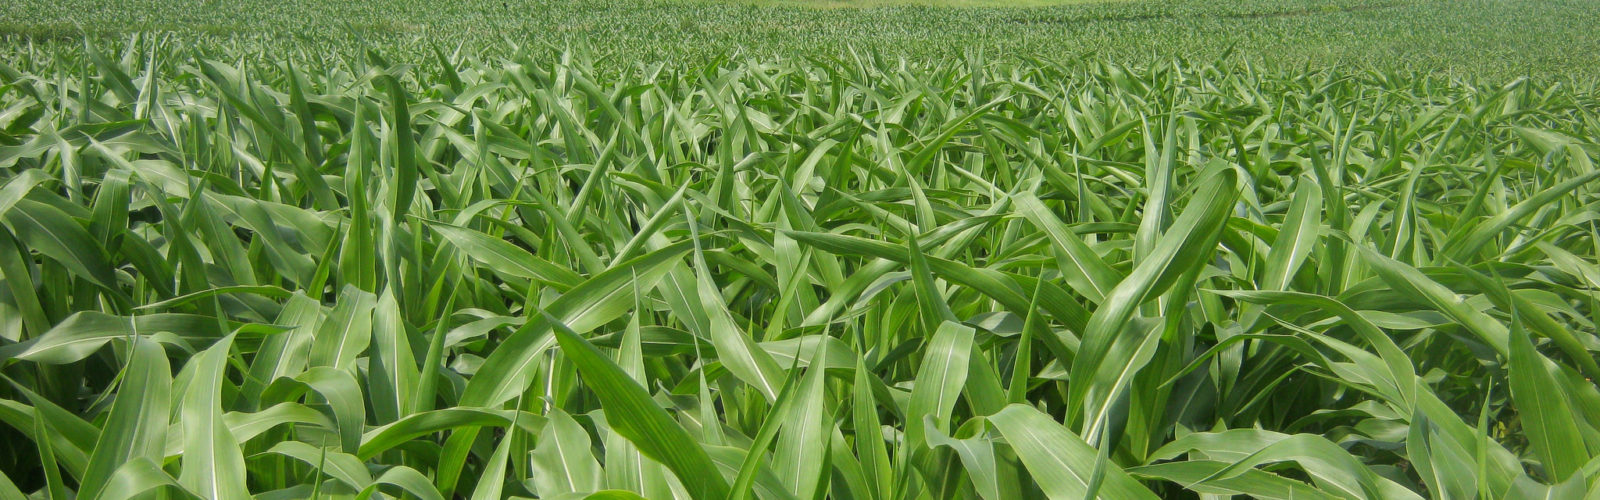 Photo of a green corn